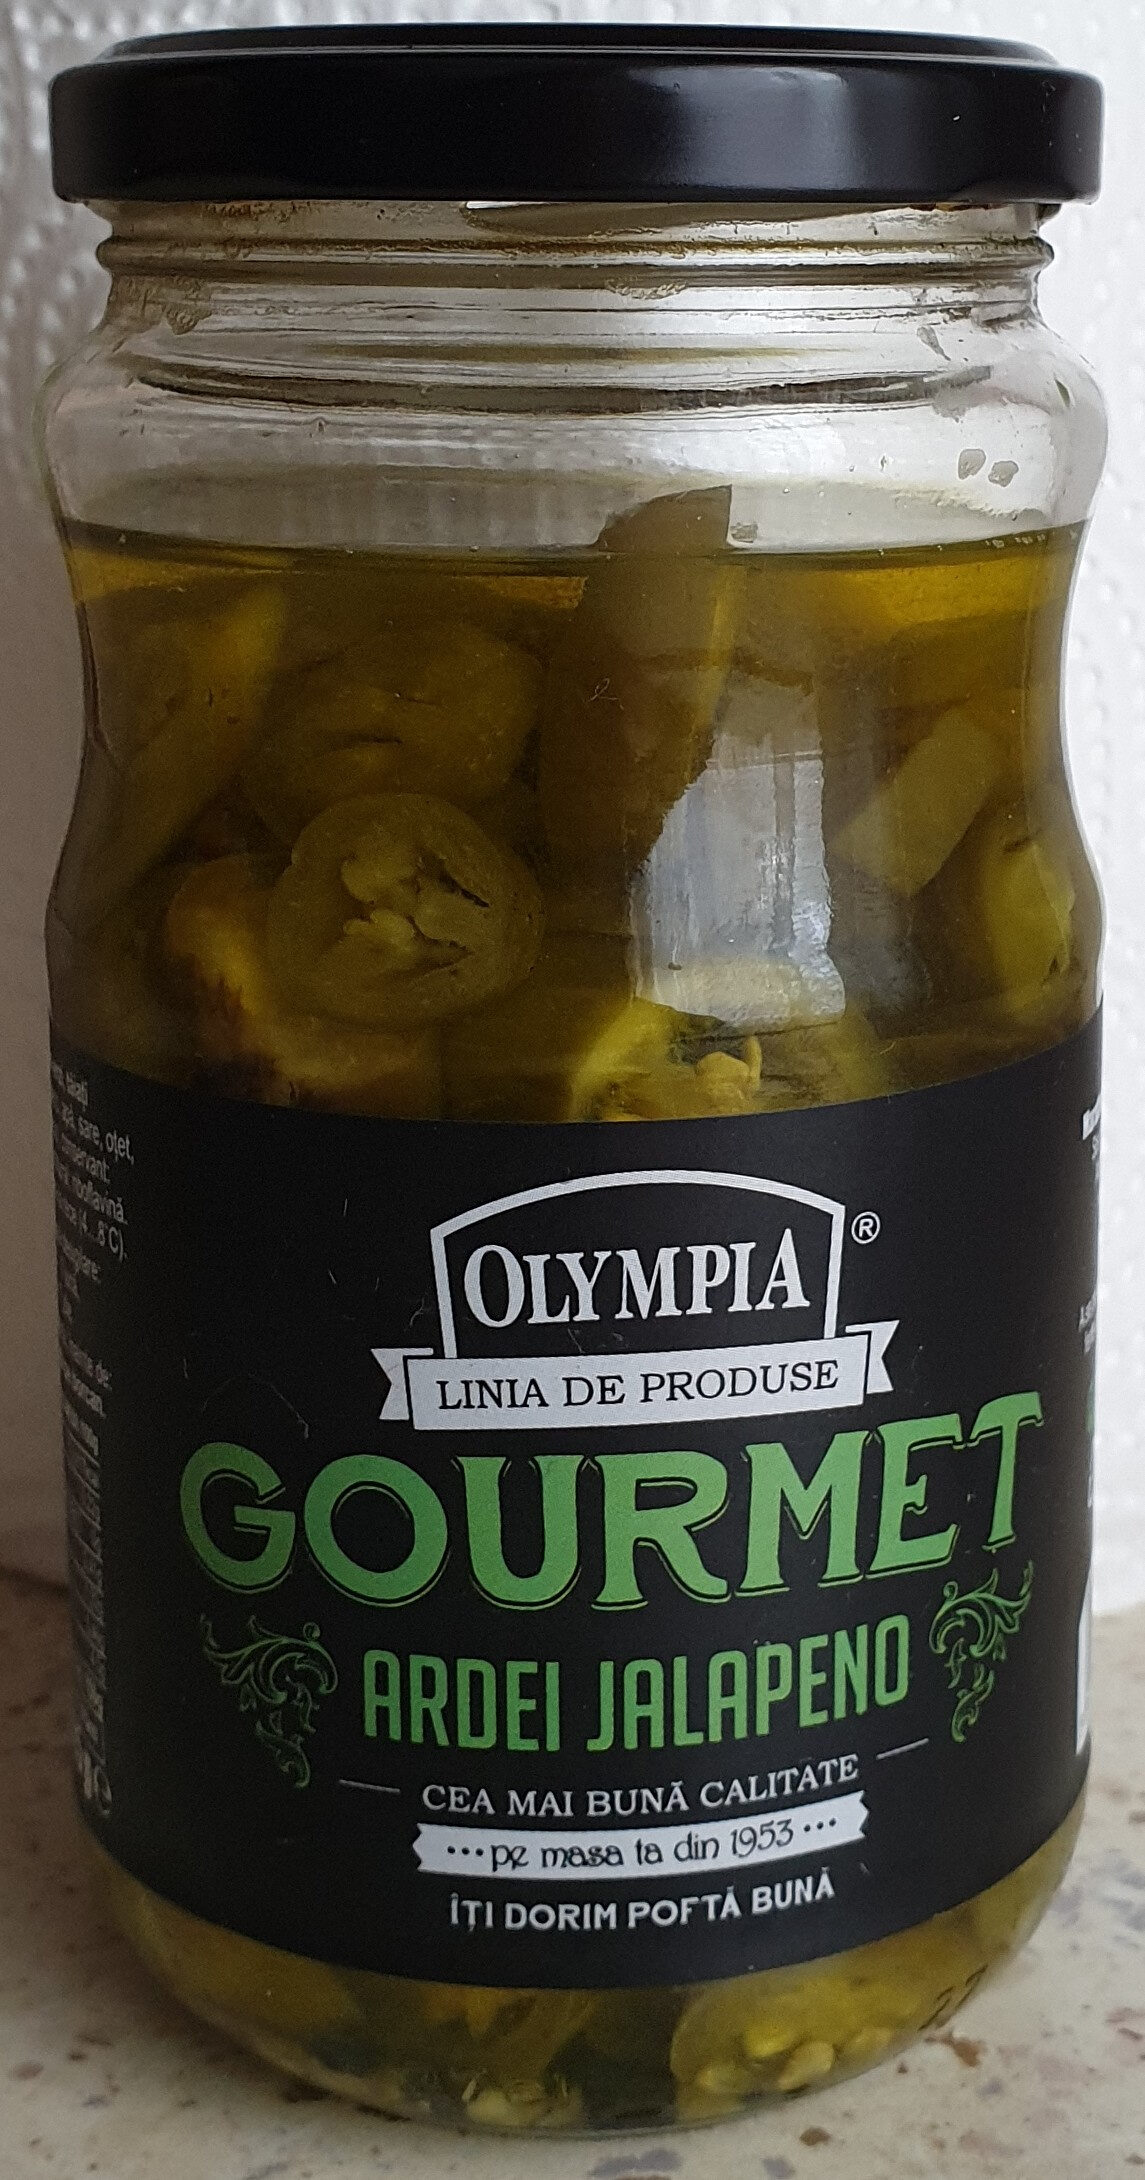 Olympia Ardei Jalapeno - Product - ro